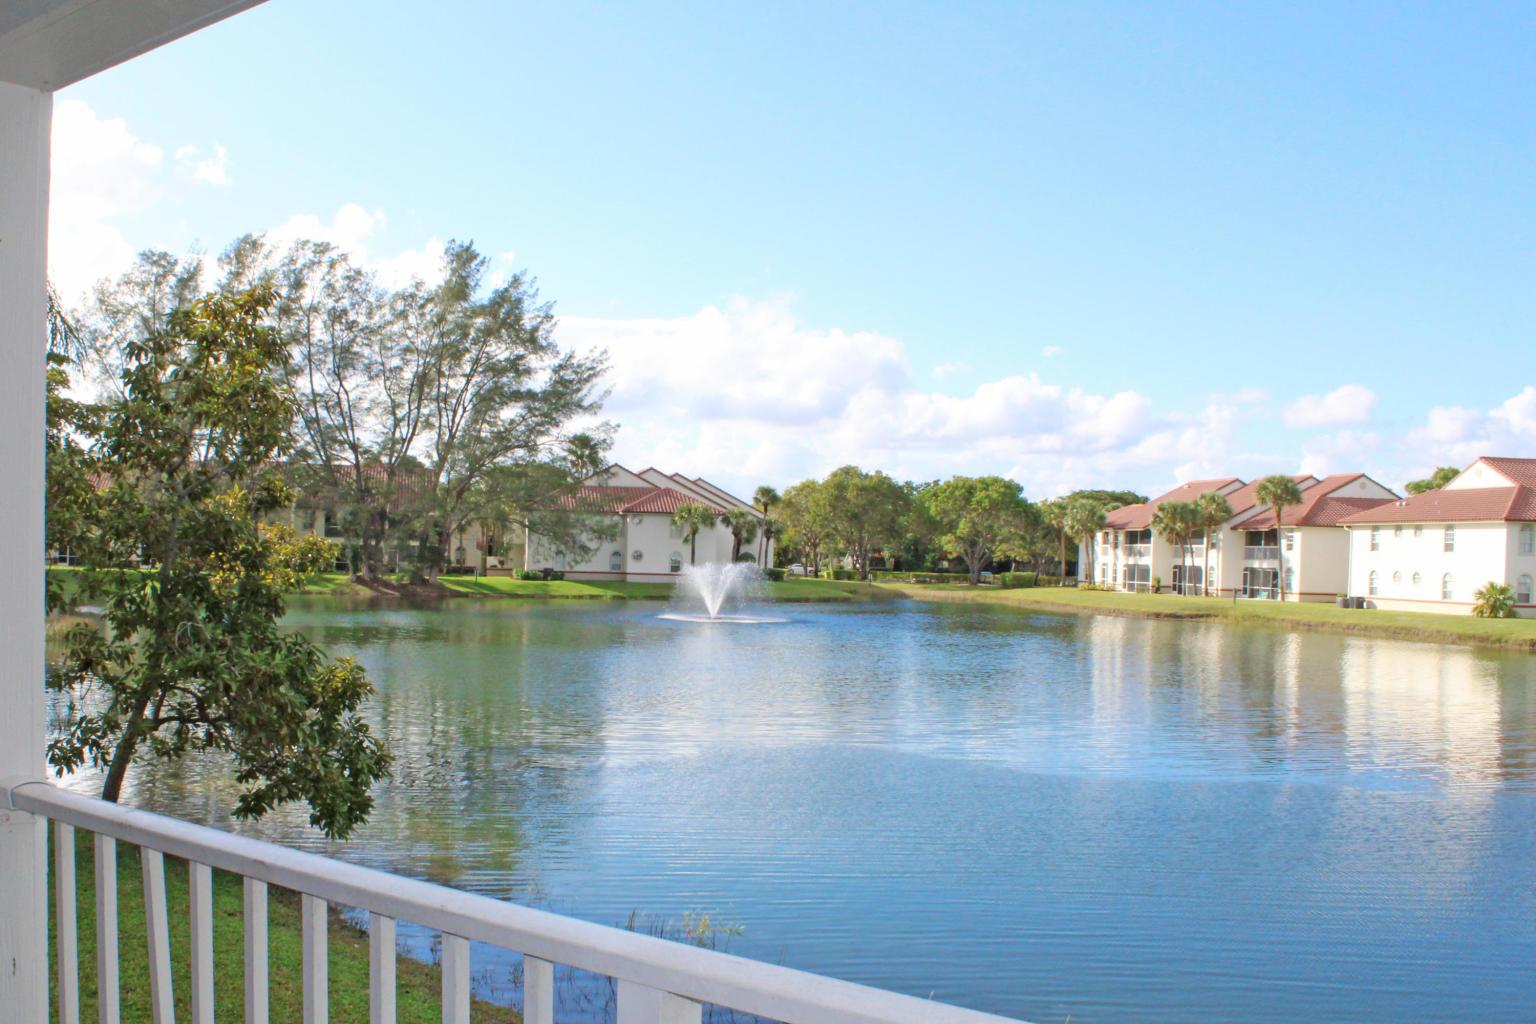 181 Cypress Point Drive 181, Palm Beach Gardens, Florida 33418, 1 Bedroom Bedrooms, ,1 BathroomBathrooms,F,Condominium,Cypress Point,RX-10612999